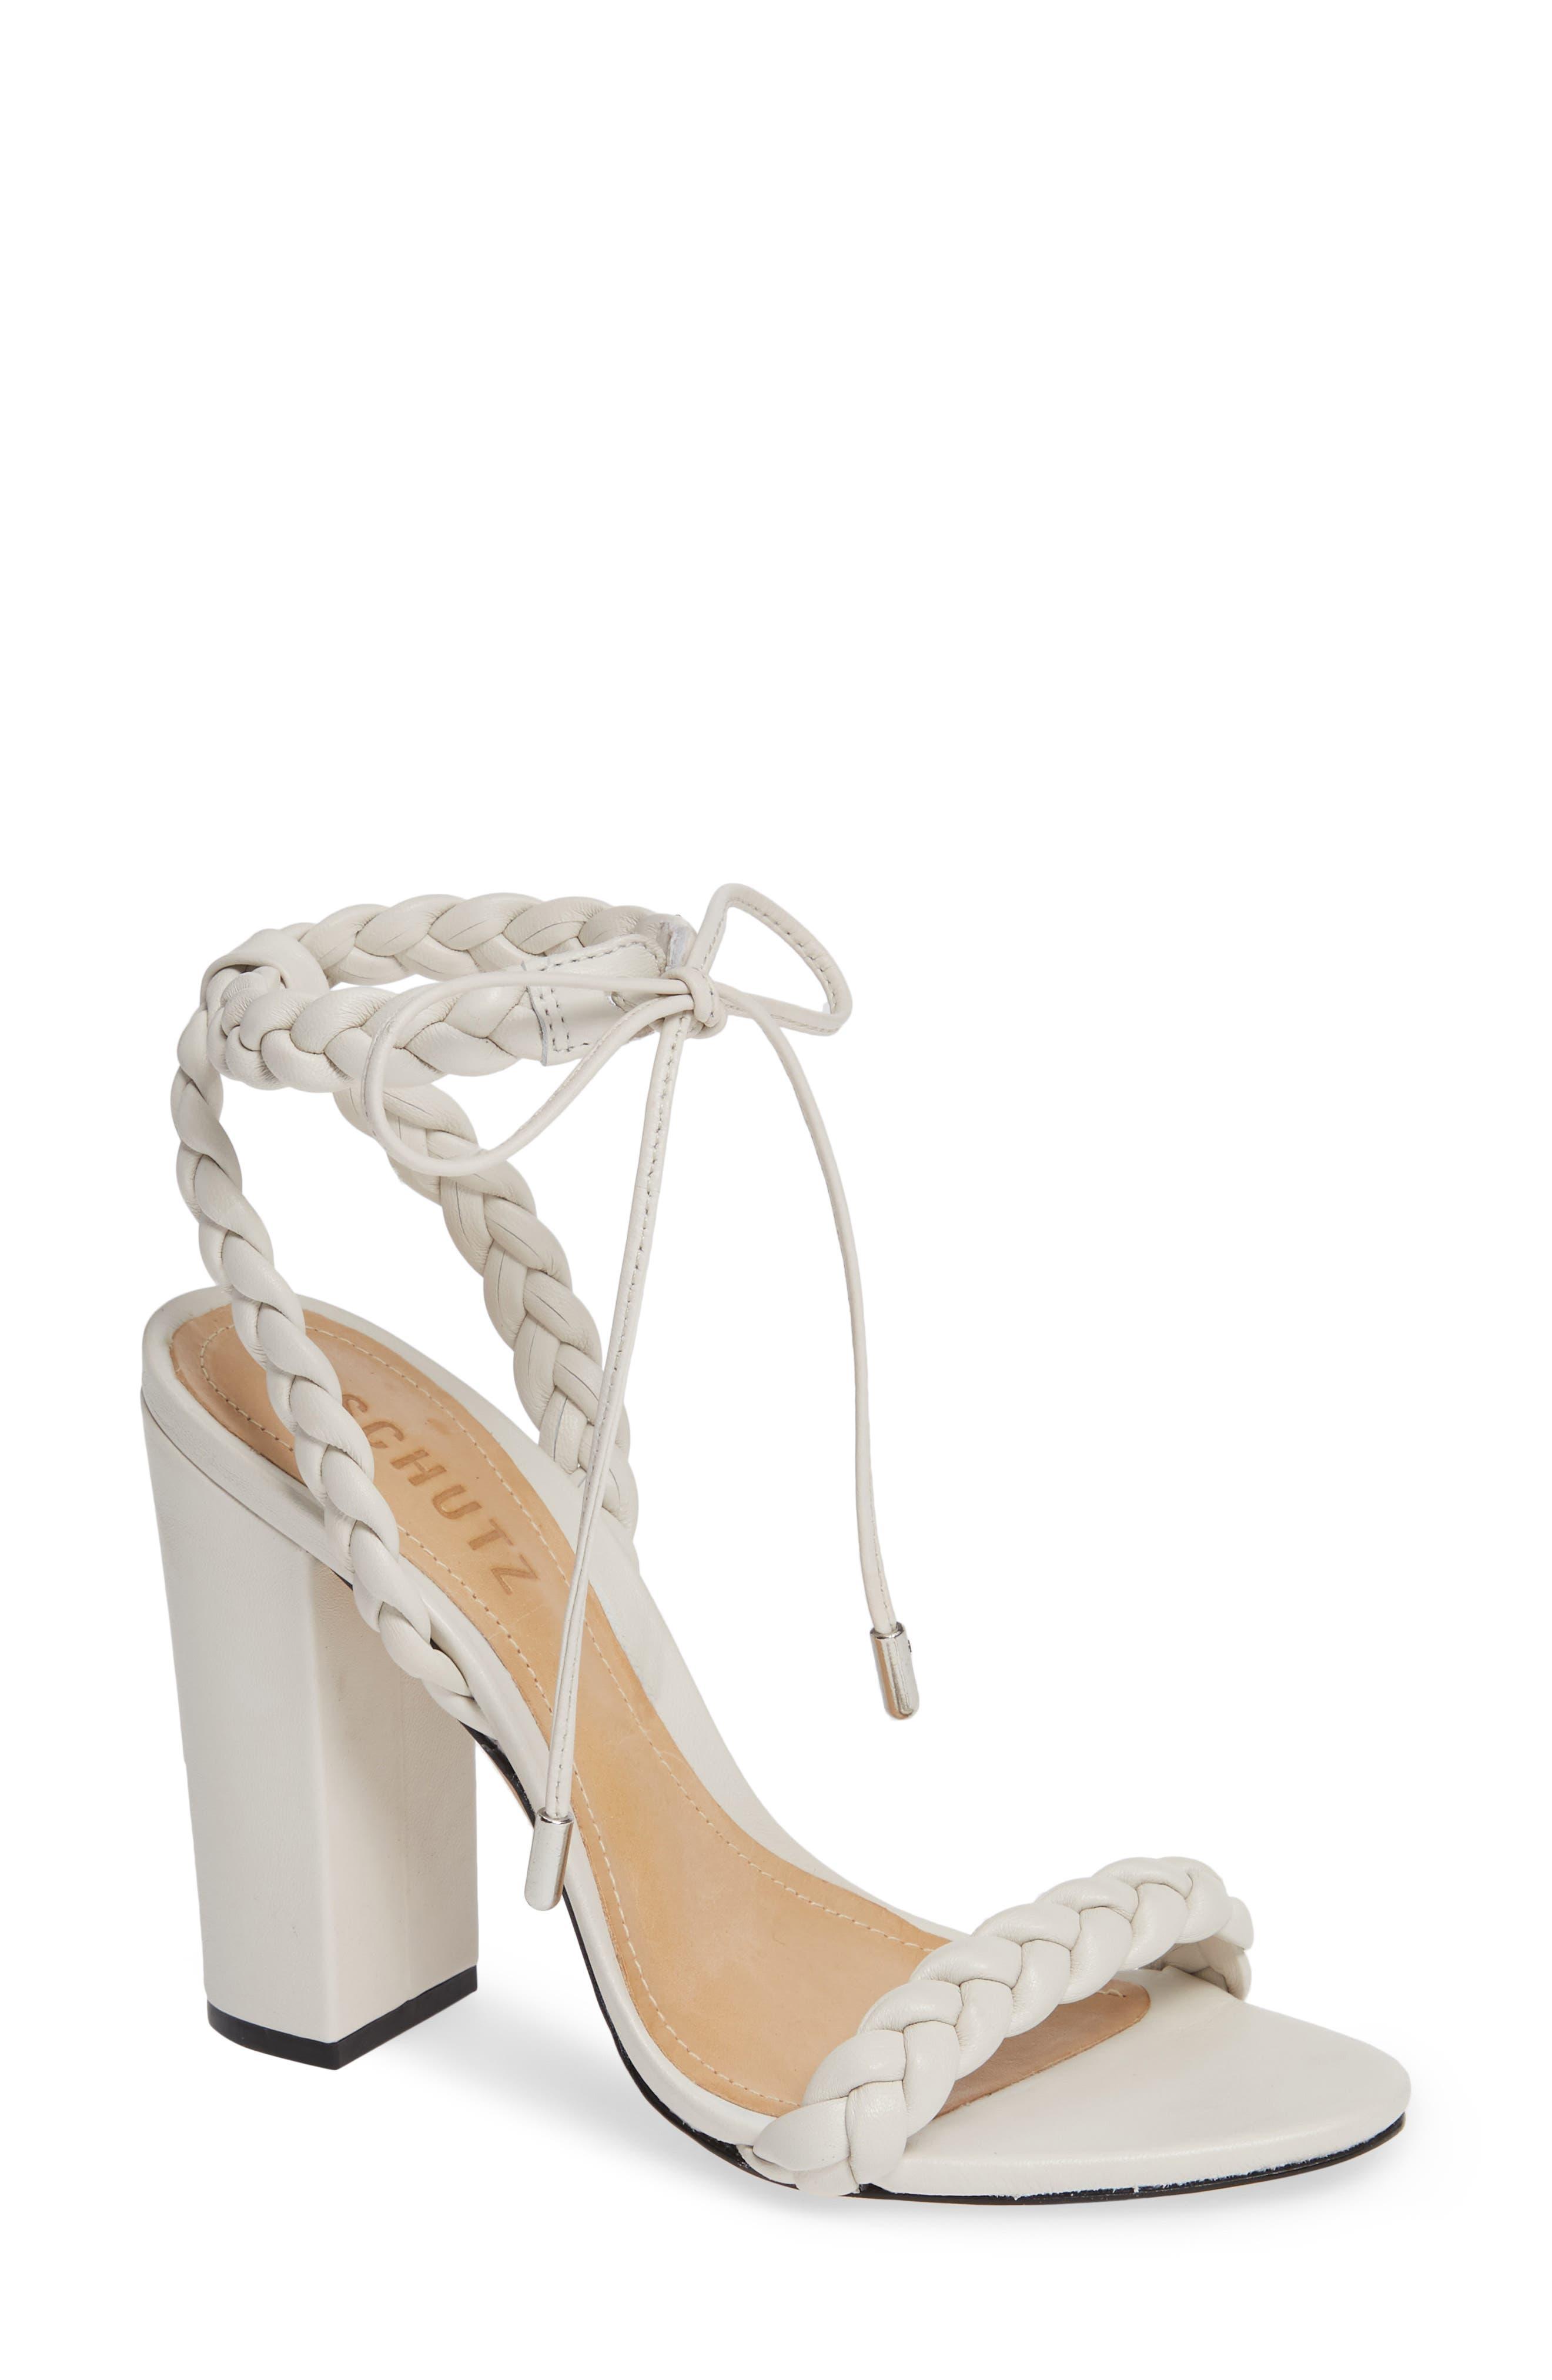 Lainna Braided Strap Sandal,                         Main,                         color, PEARL